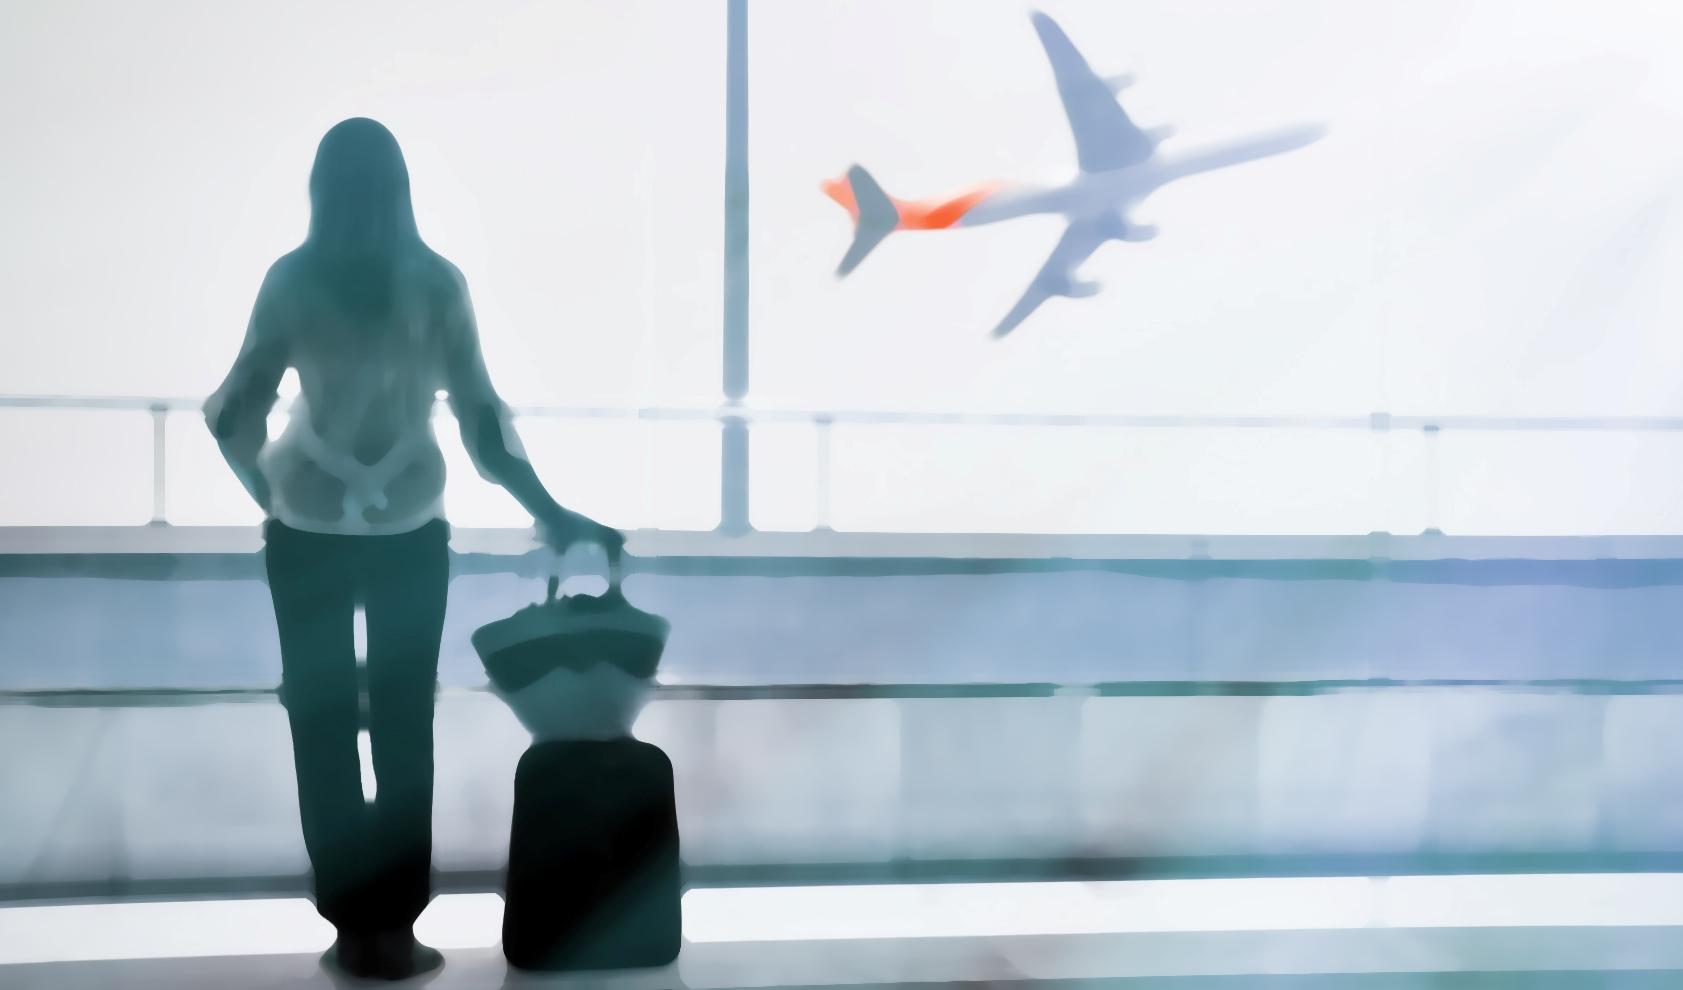 ketinggalan pesawat